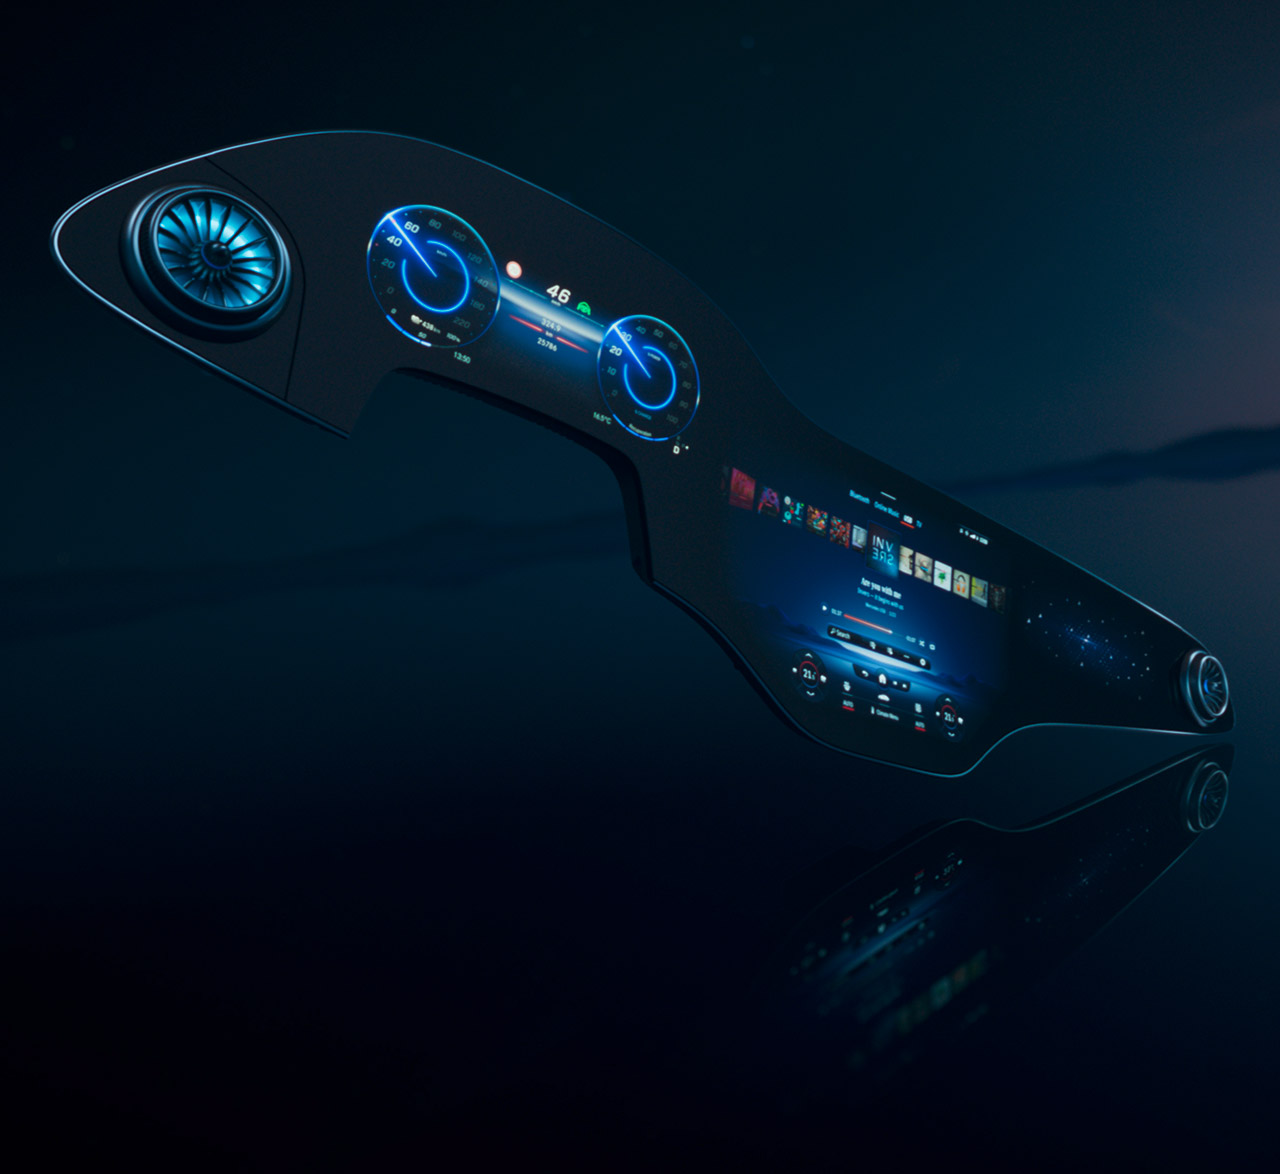 Mercedes-Benz EQS Concept MBUX Hyperscreen